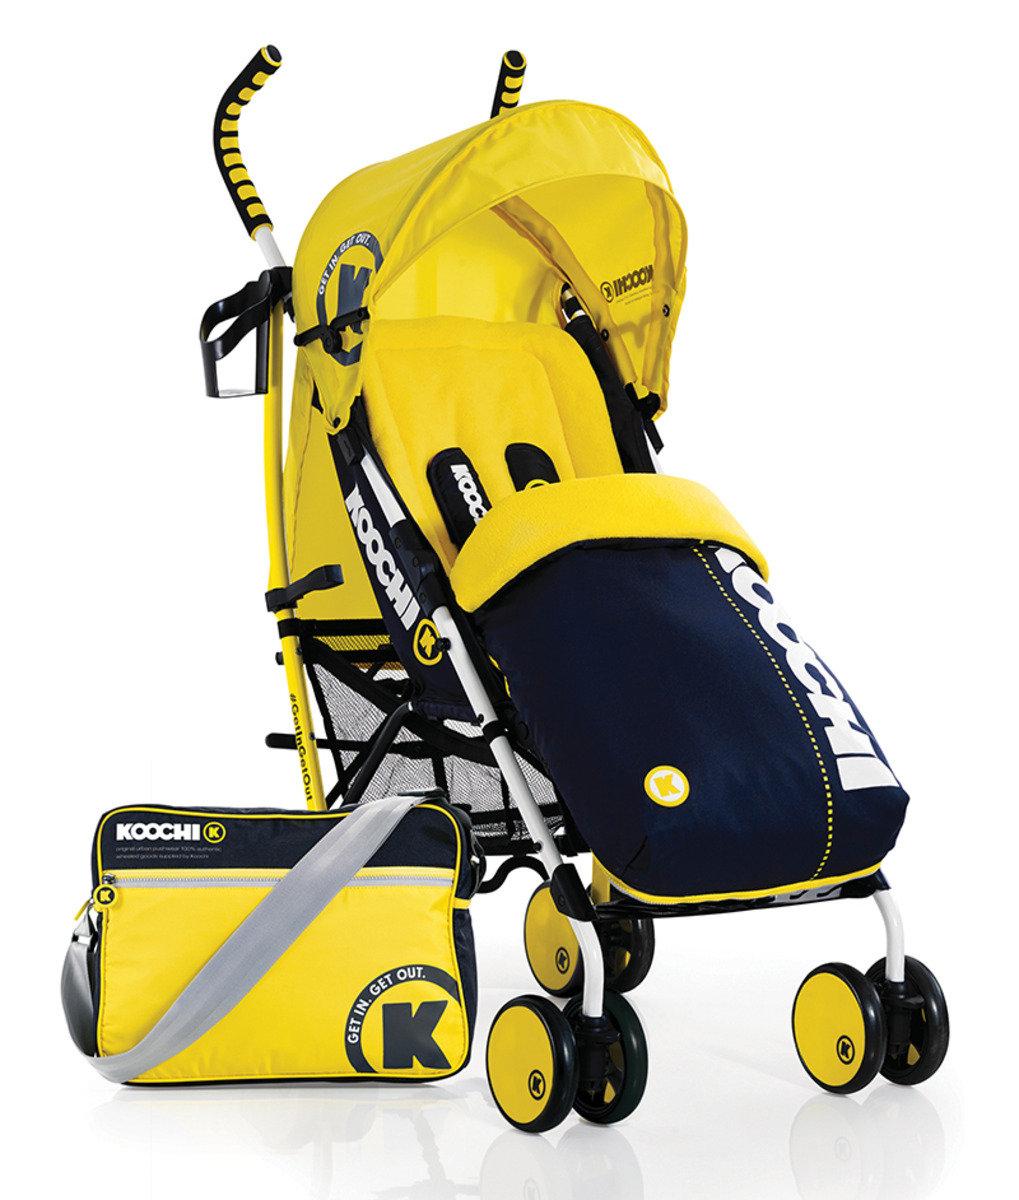 英國 Koochi Speedstar 嬰兒手推車 - Primary Yellow